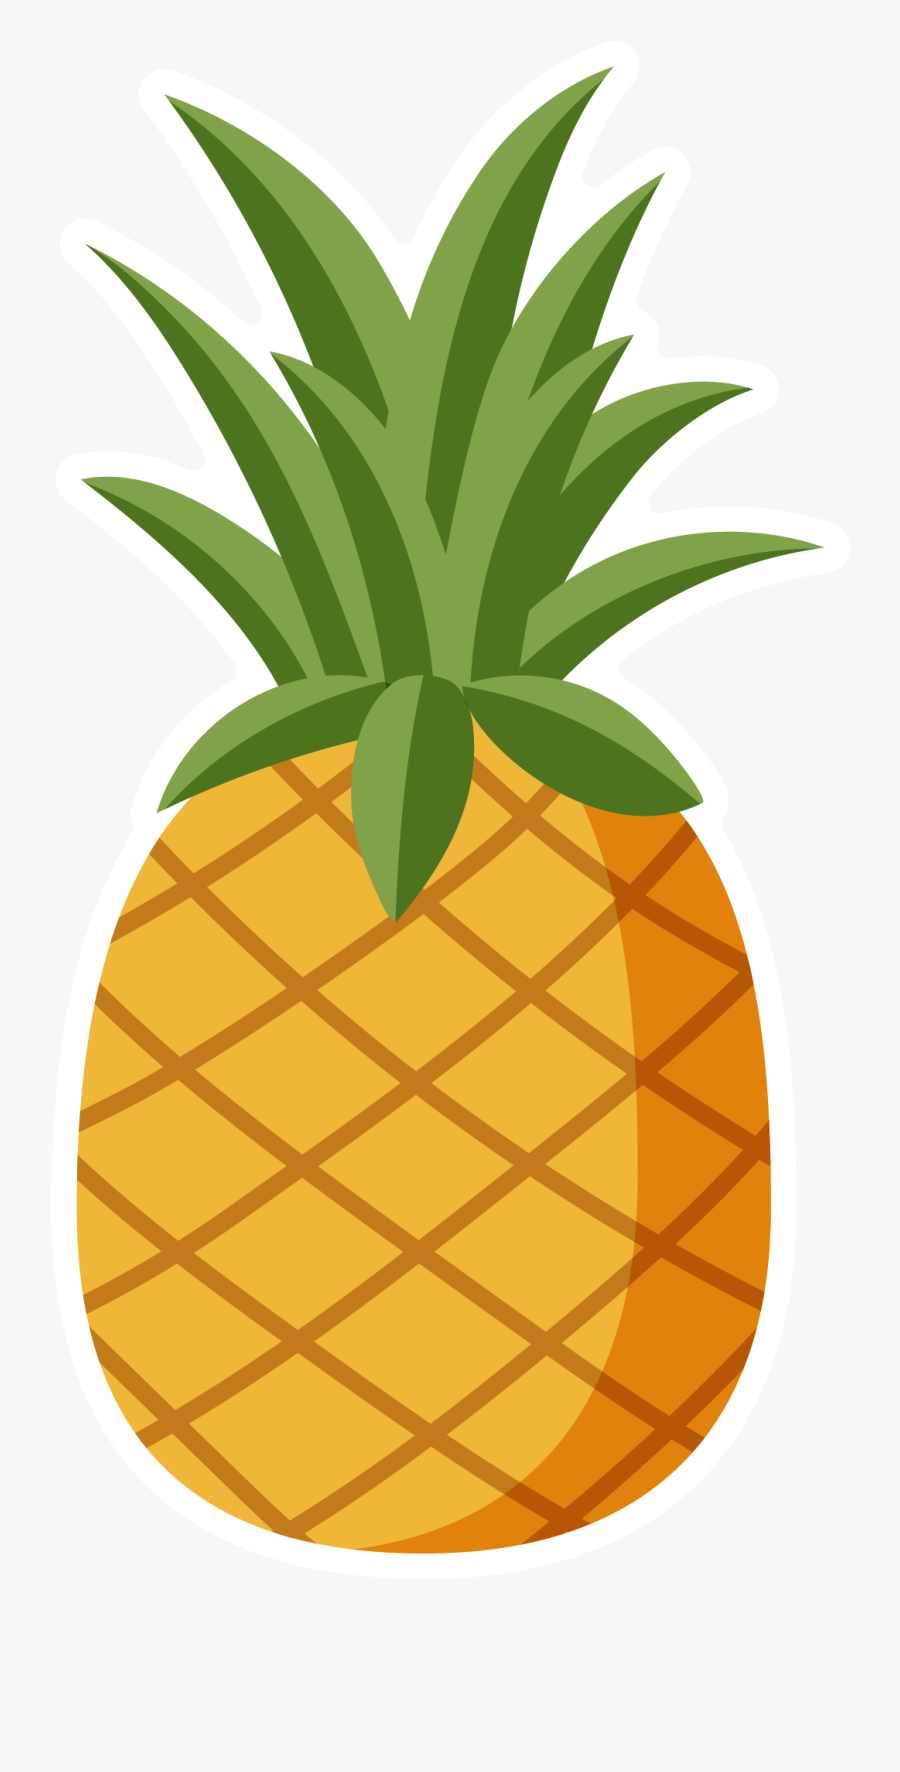 Pineapple Hawaiian Pizza Clip Art - Pineapple Pizza Lover Meme, Transparent Clipart